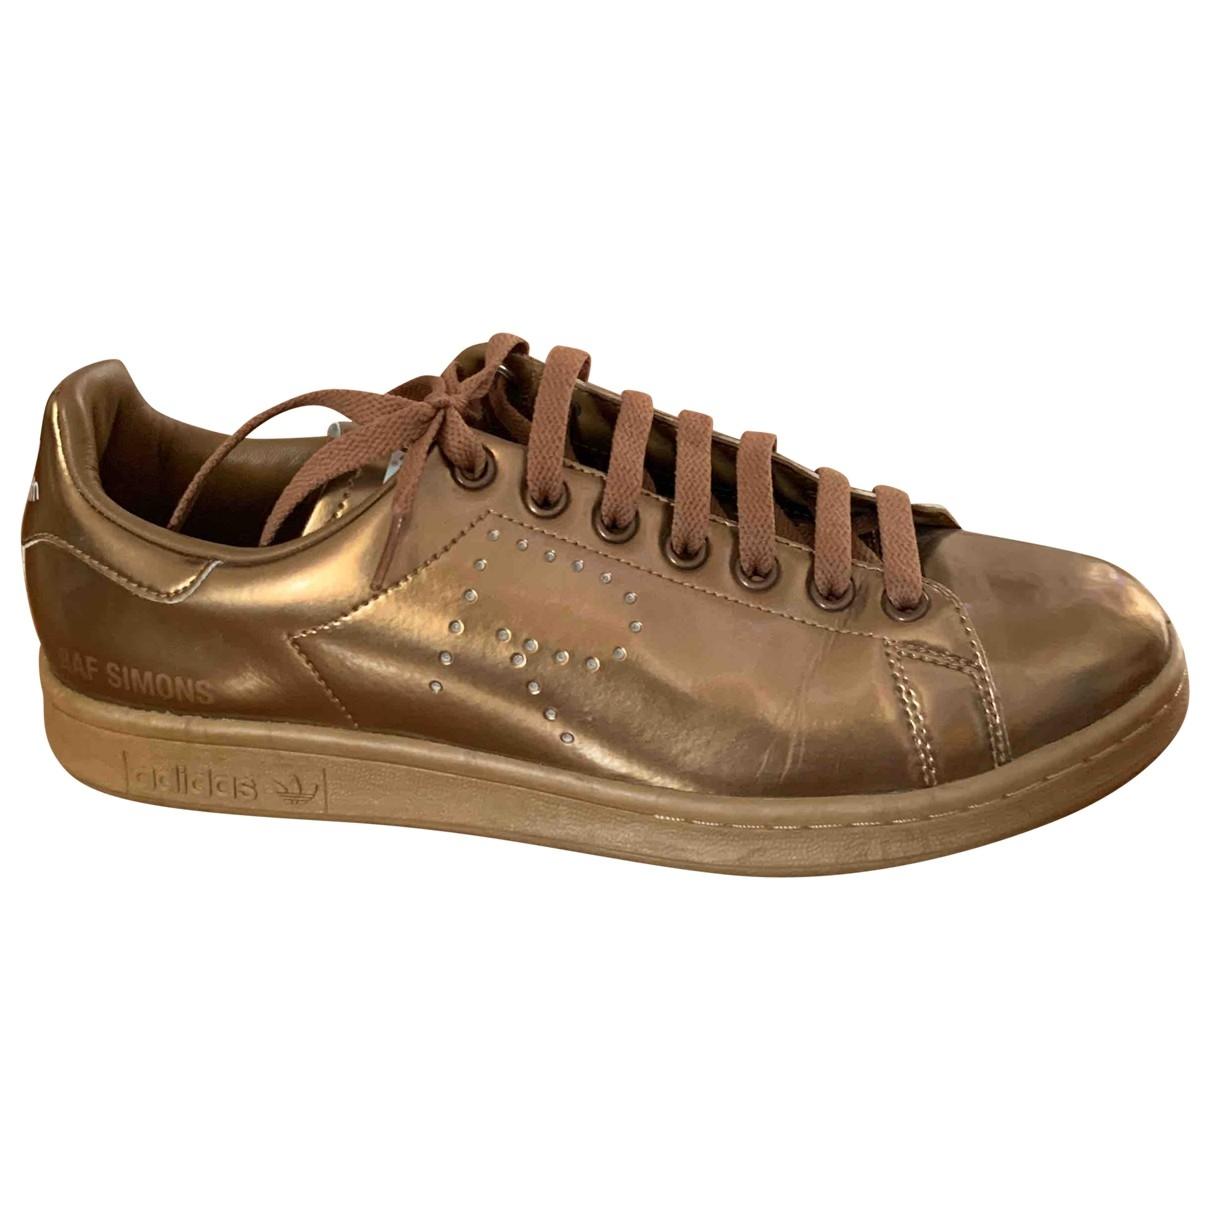 Adidas X Raf Simons - Baskets Stan Smith pour homme en cuir - metallise